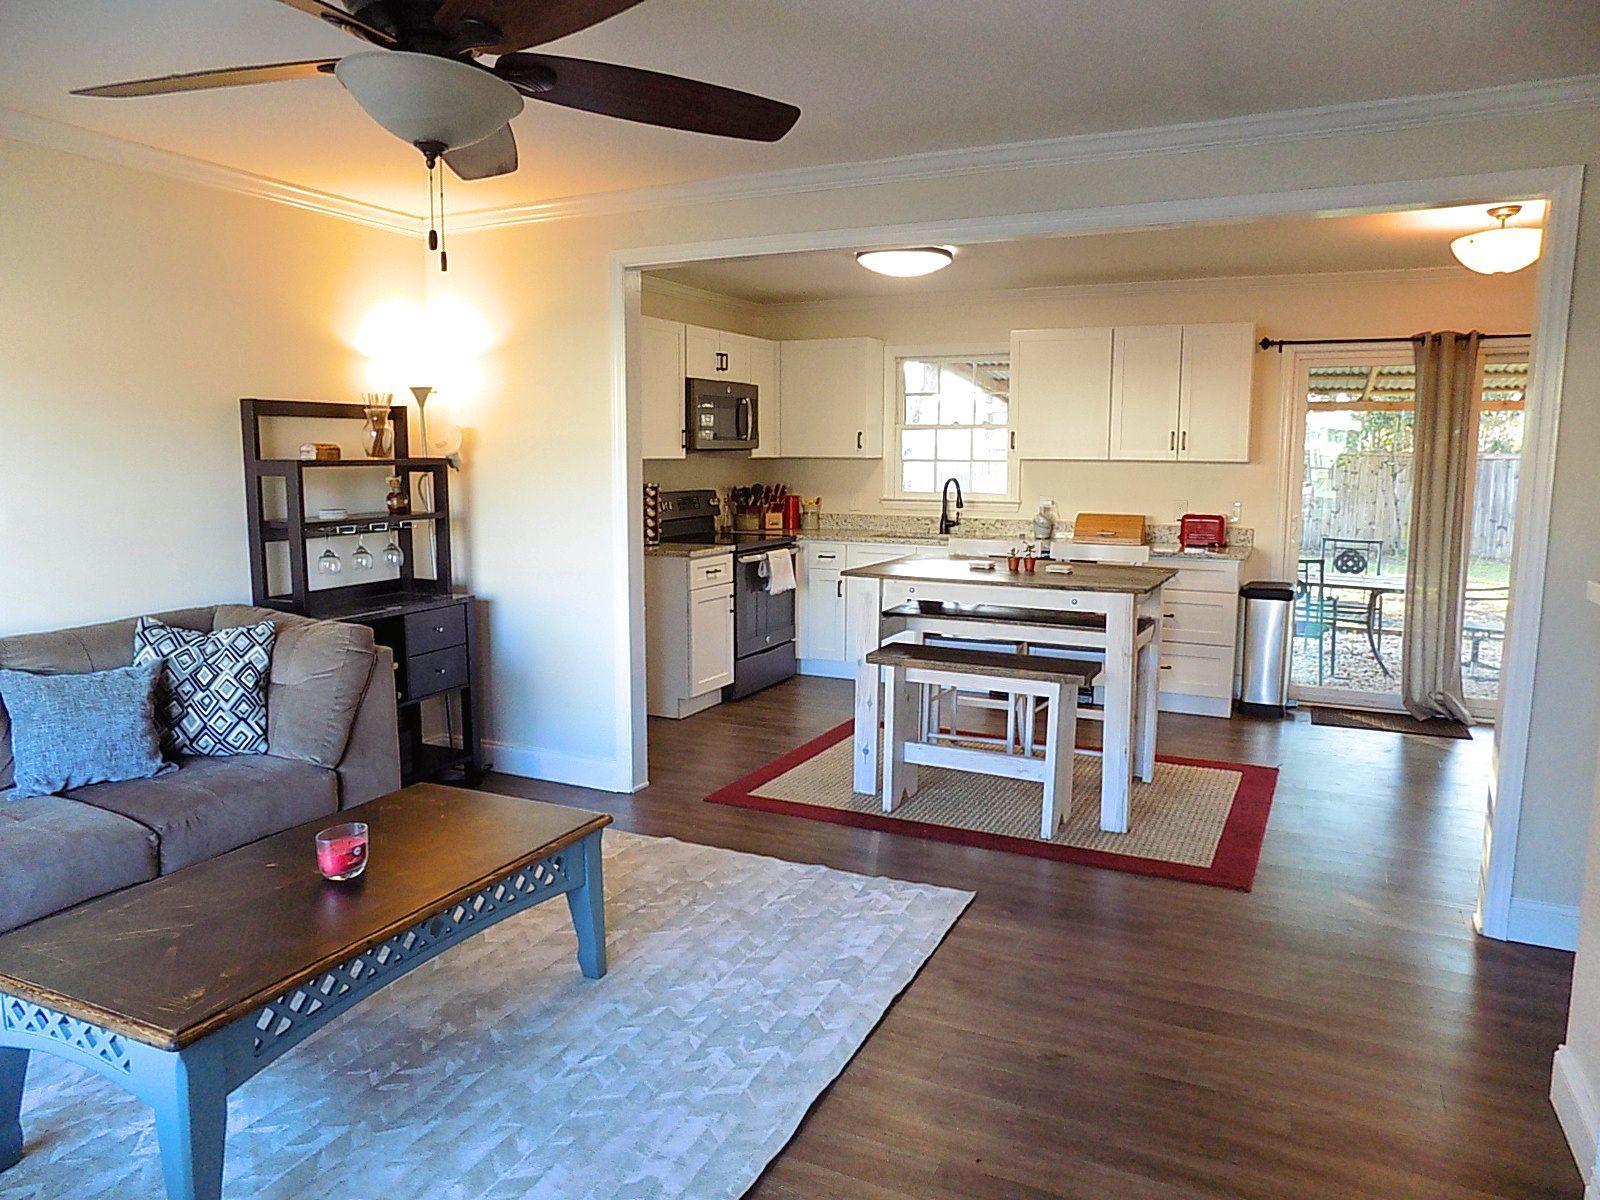 West Ashley Plantation Homes For Sale - 1720 Boone Hall, Charleston, SC - 18